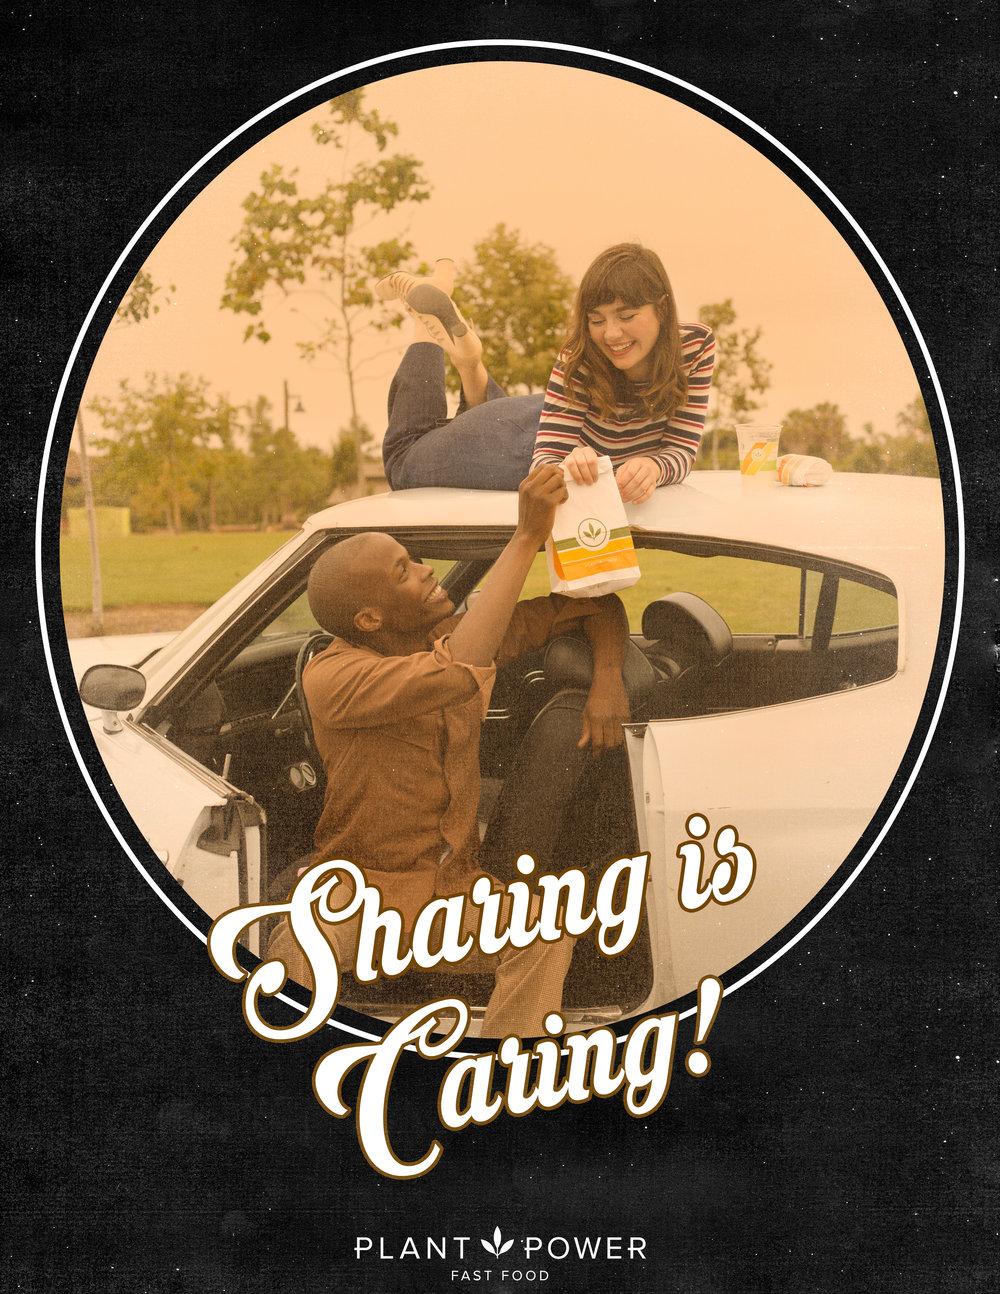 SharingisCaring-Black-aug.jpg